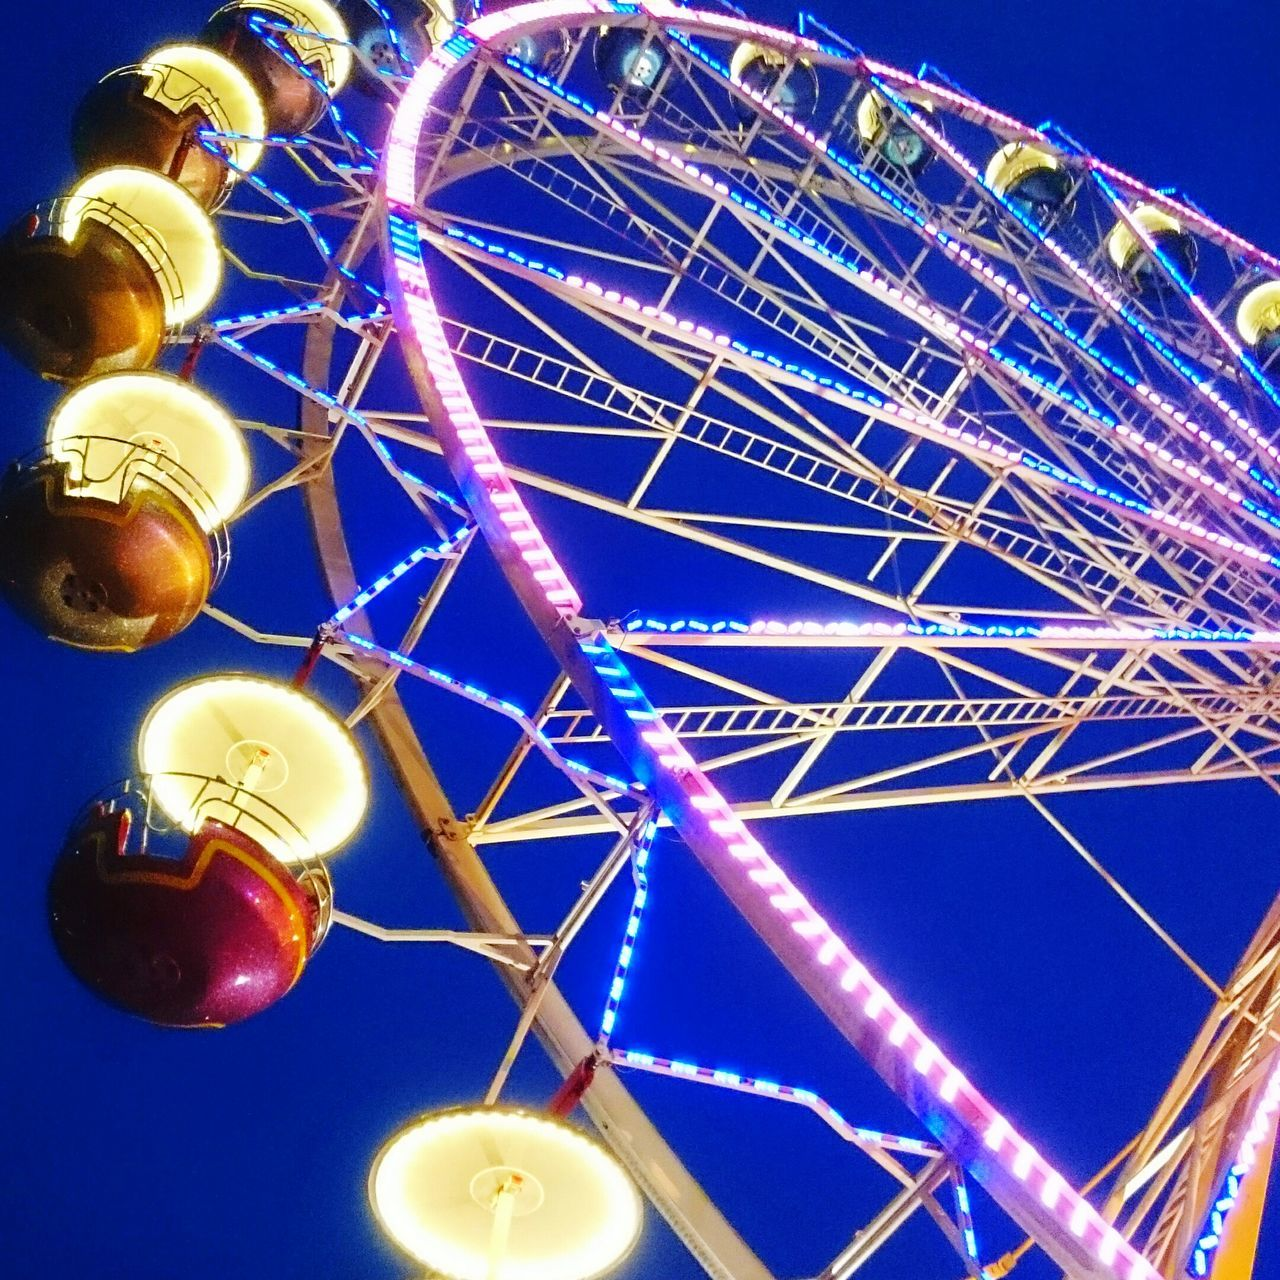 Ferris Wheel Blaue Stunde Kirmes Jahrmarkt Riesenrad Leipzigtrip